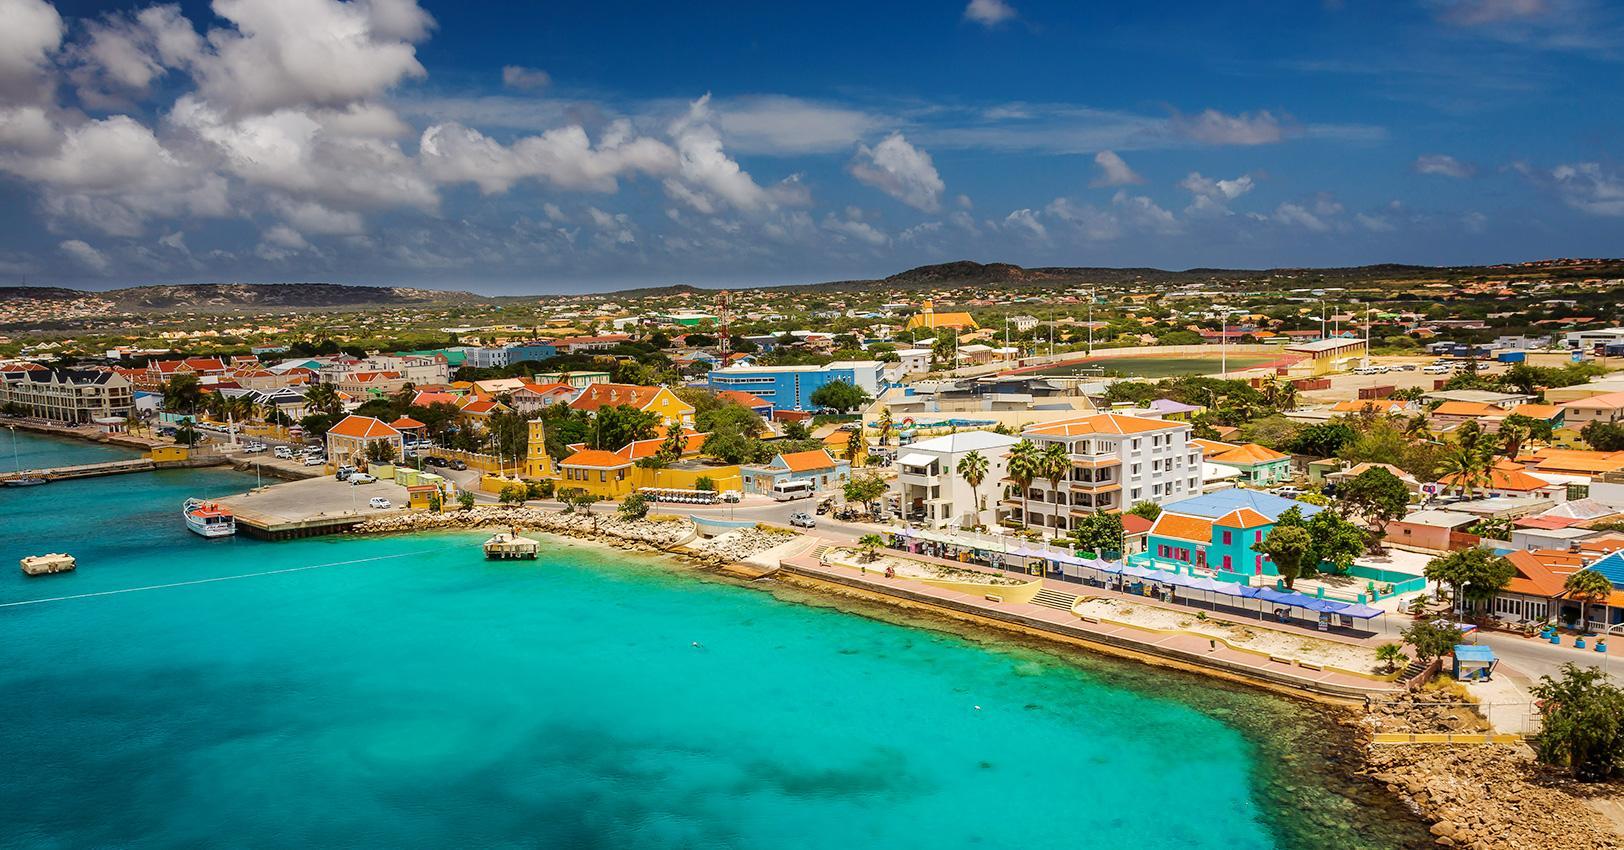 GM-Bonaire-Thumb2-1530043239193.jpg